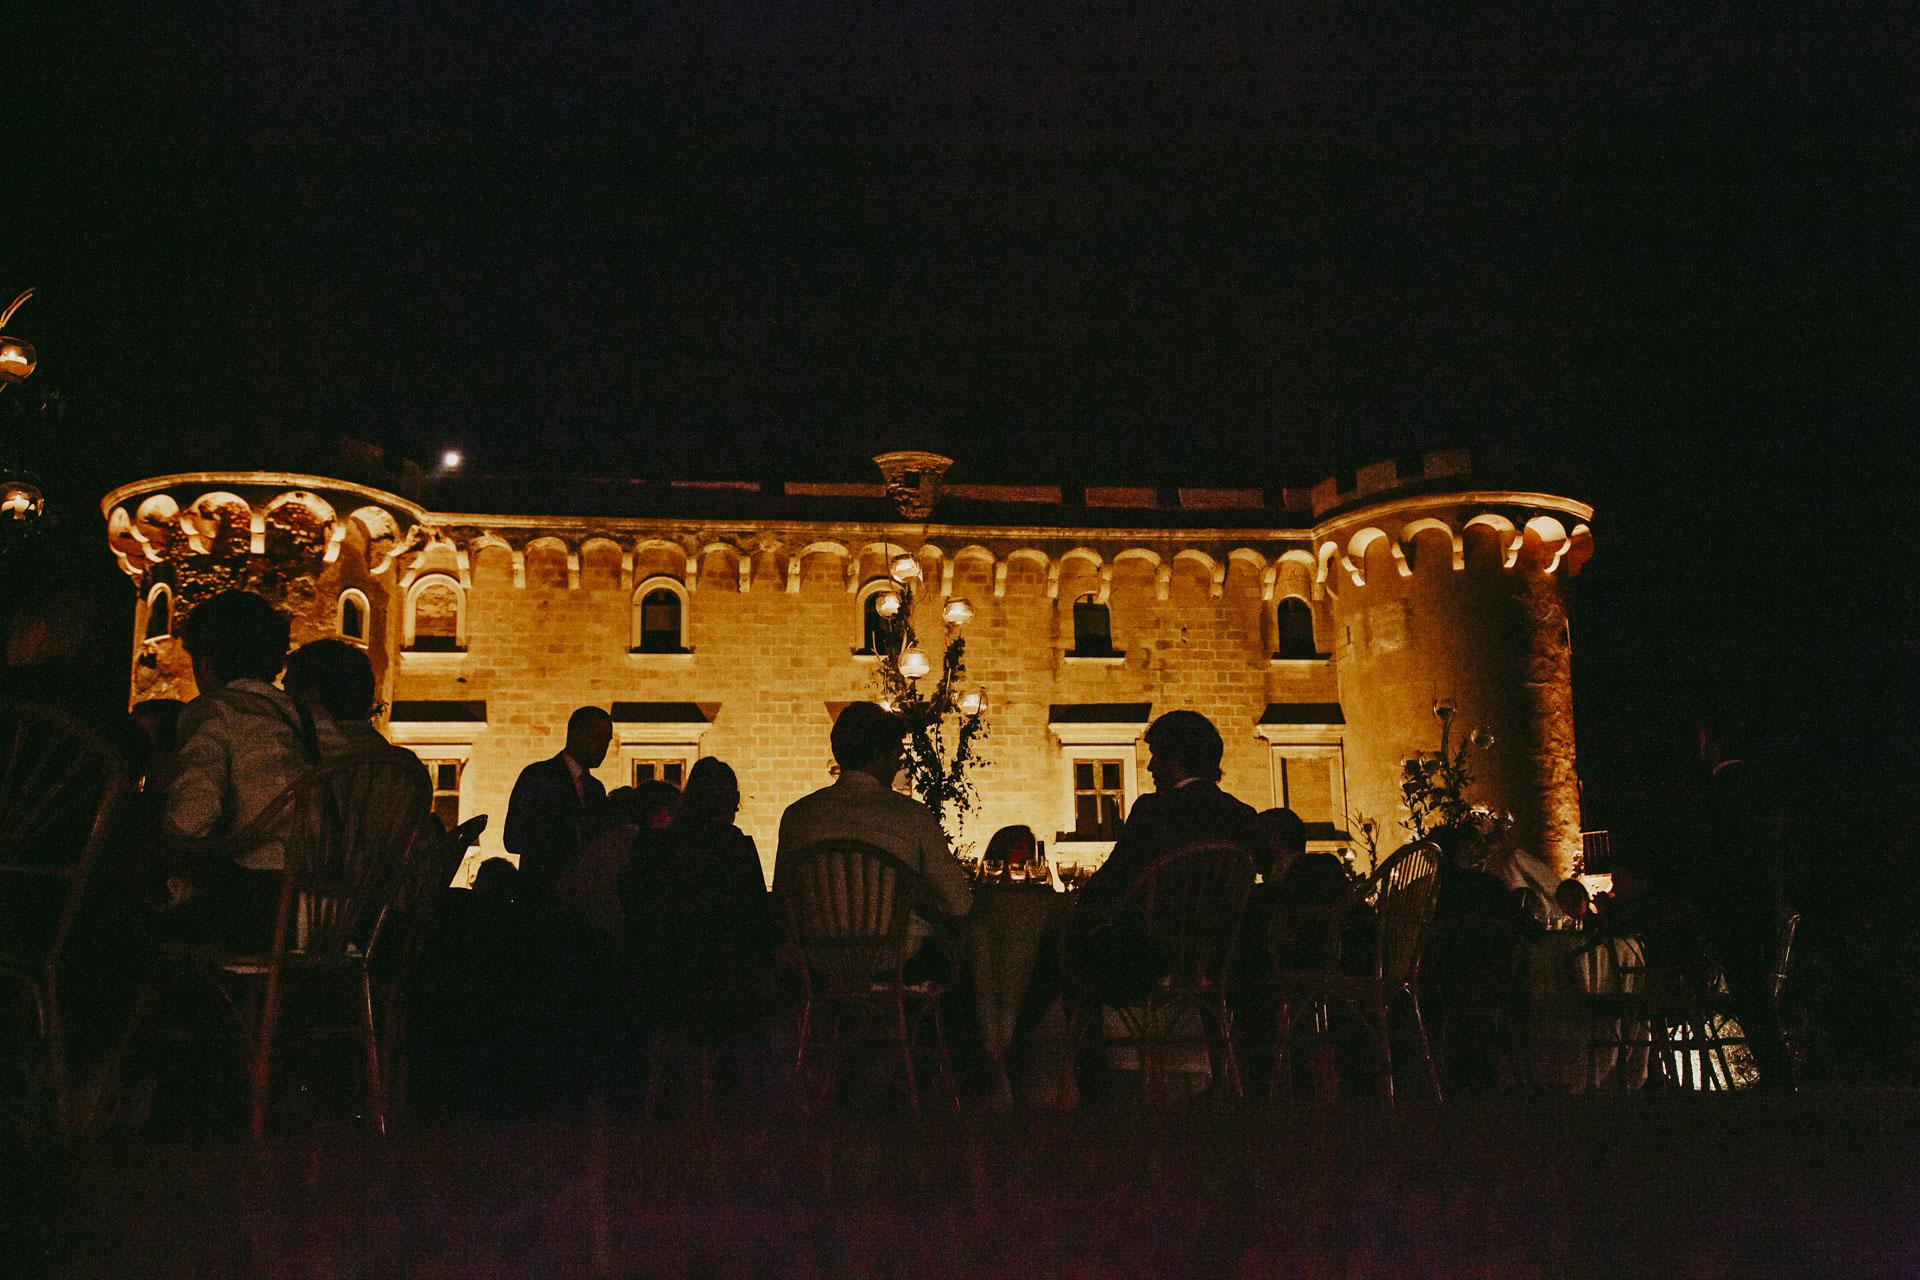 Matrimonio Castello Odescalchi, Palo LazialeMatrimonio Castello Odescalchi, Palo Laziale